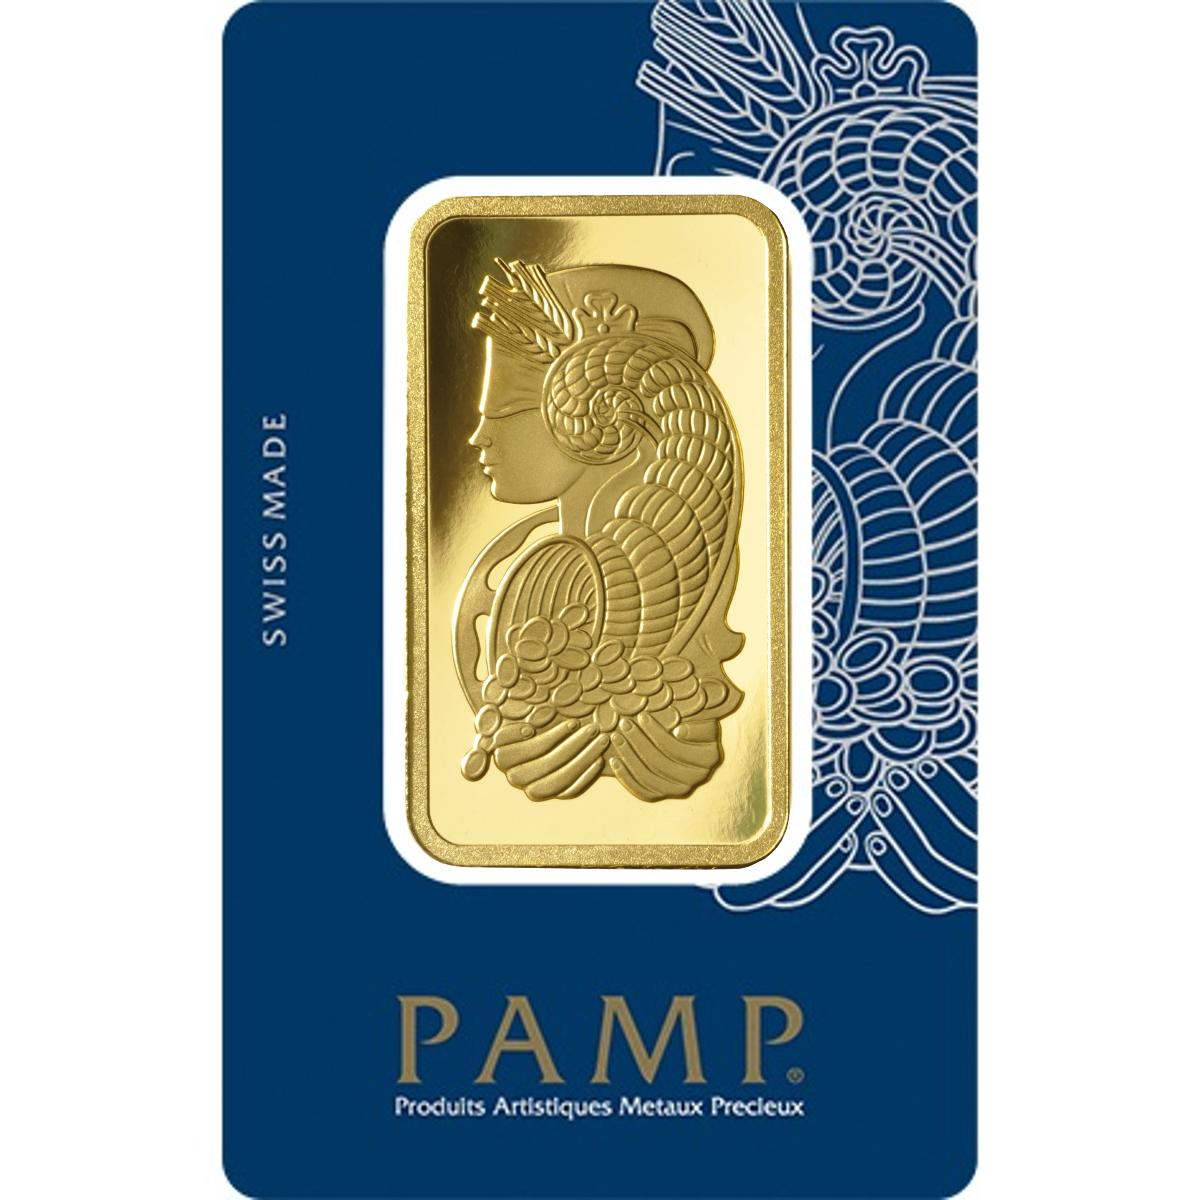 PAMP 100 Gram Gold Bar Minted